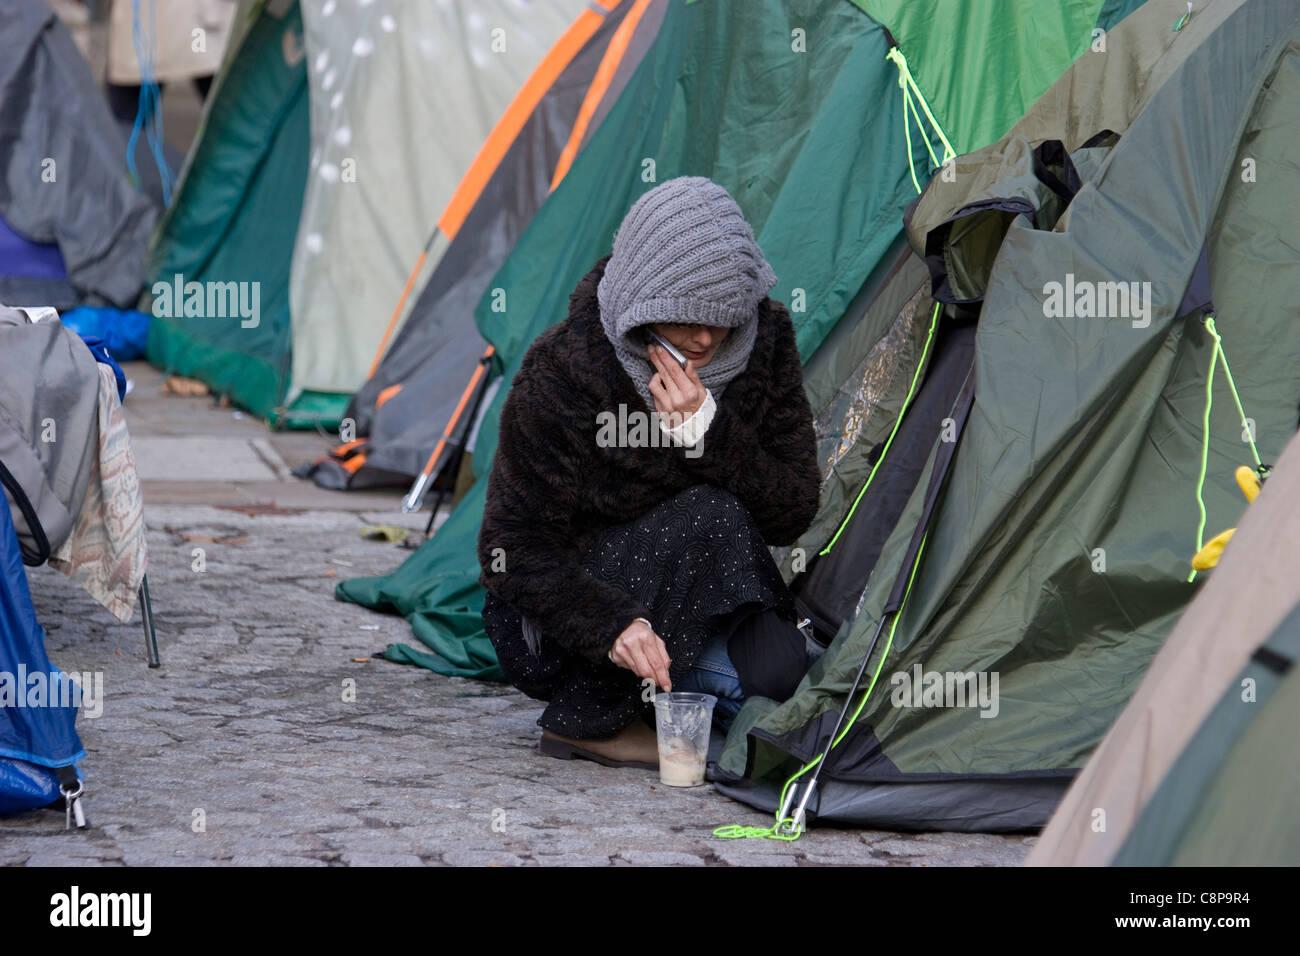 Camping protestataire à la cathédrale St Paul, occupy london protester avec tentes Photo Stock